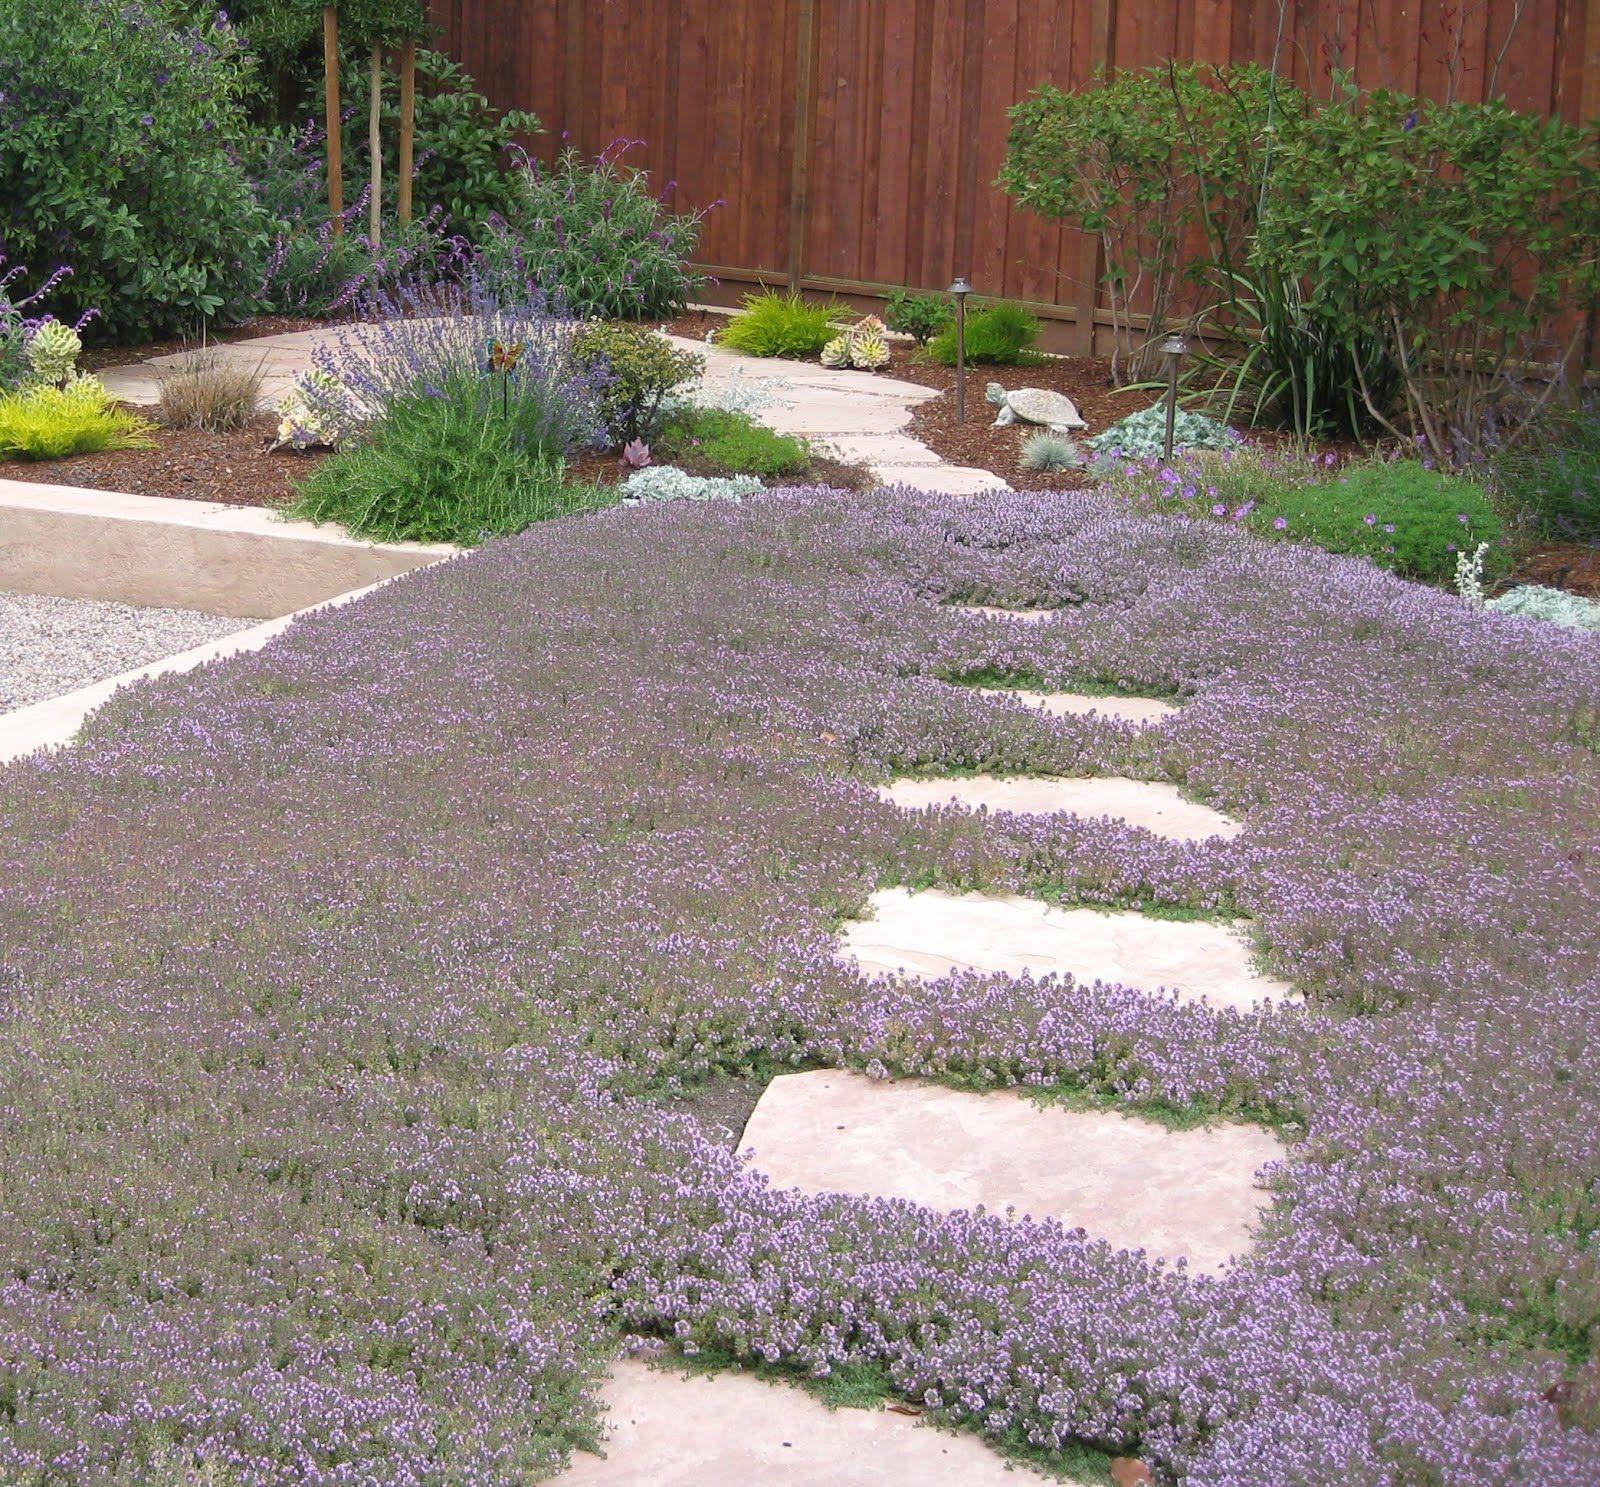 astrid gaiser garden design lilac lawns – or why water wise rocks